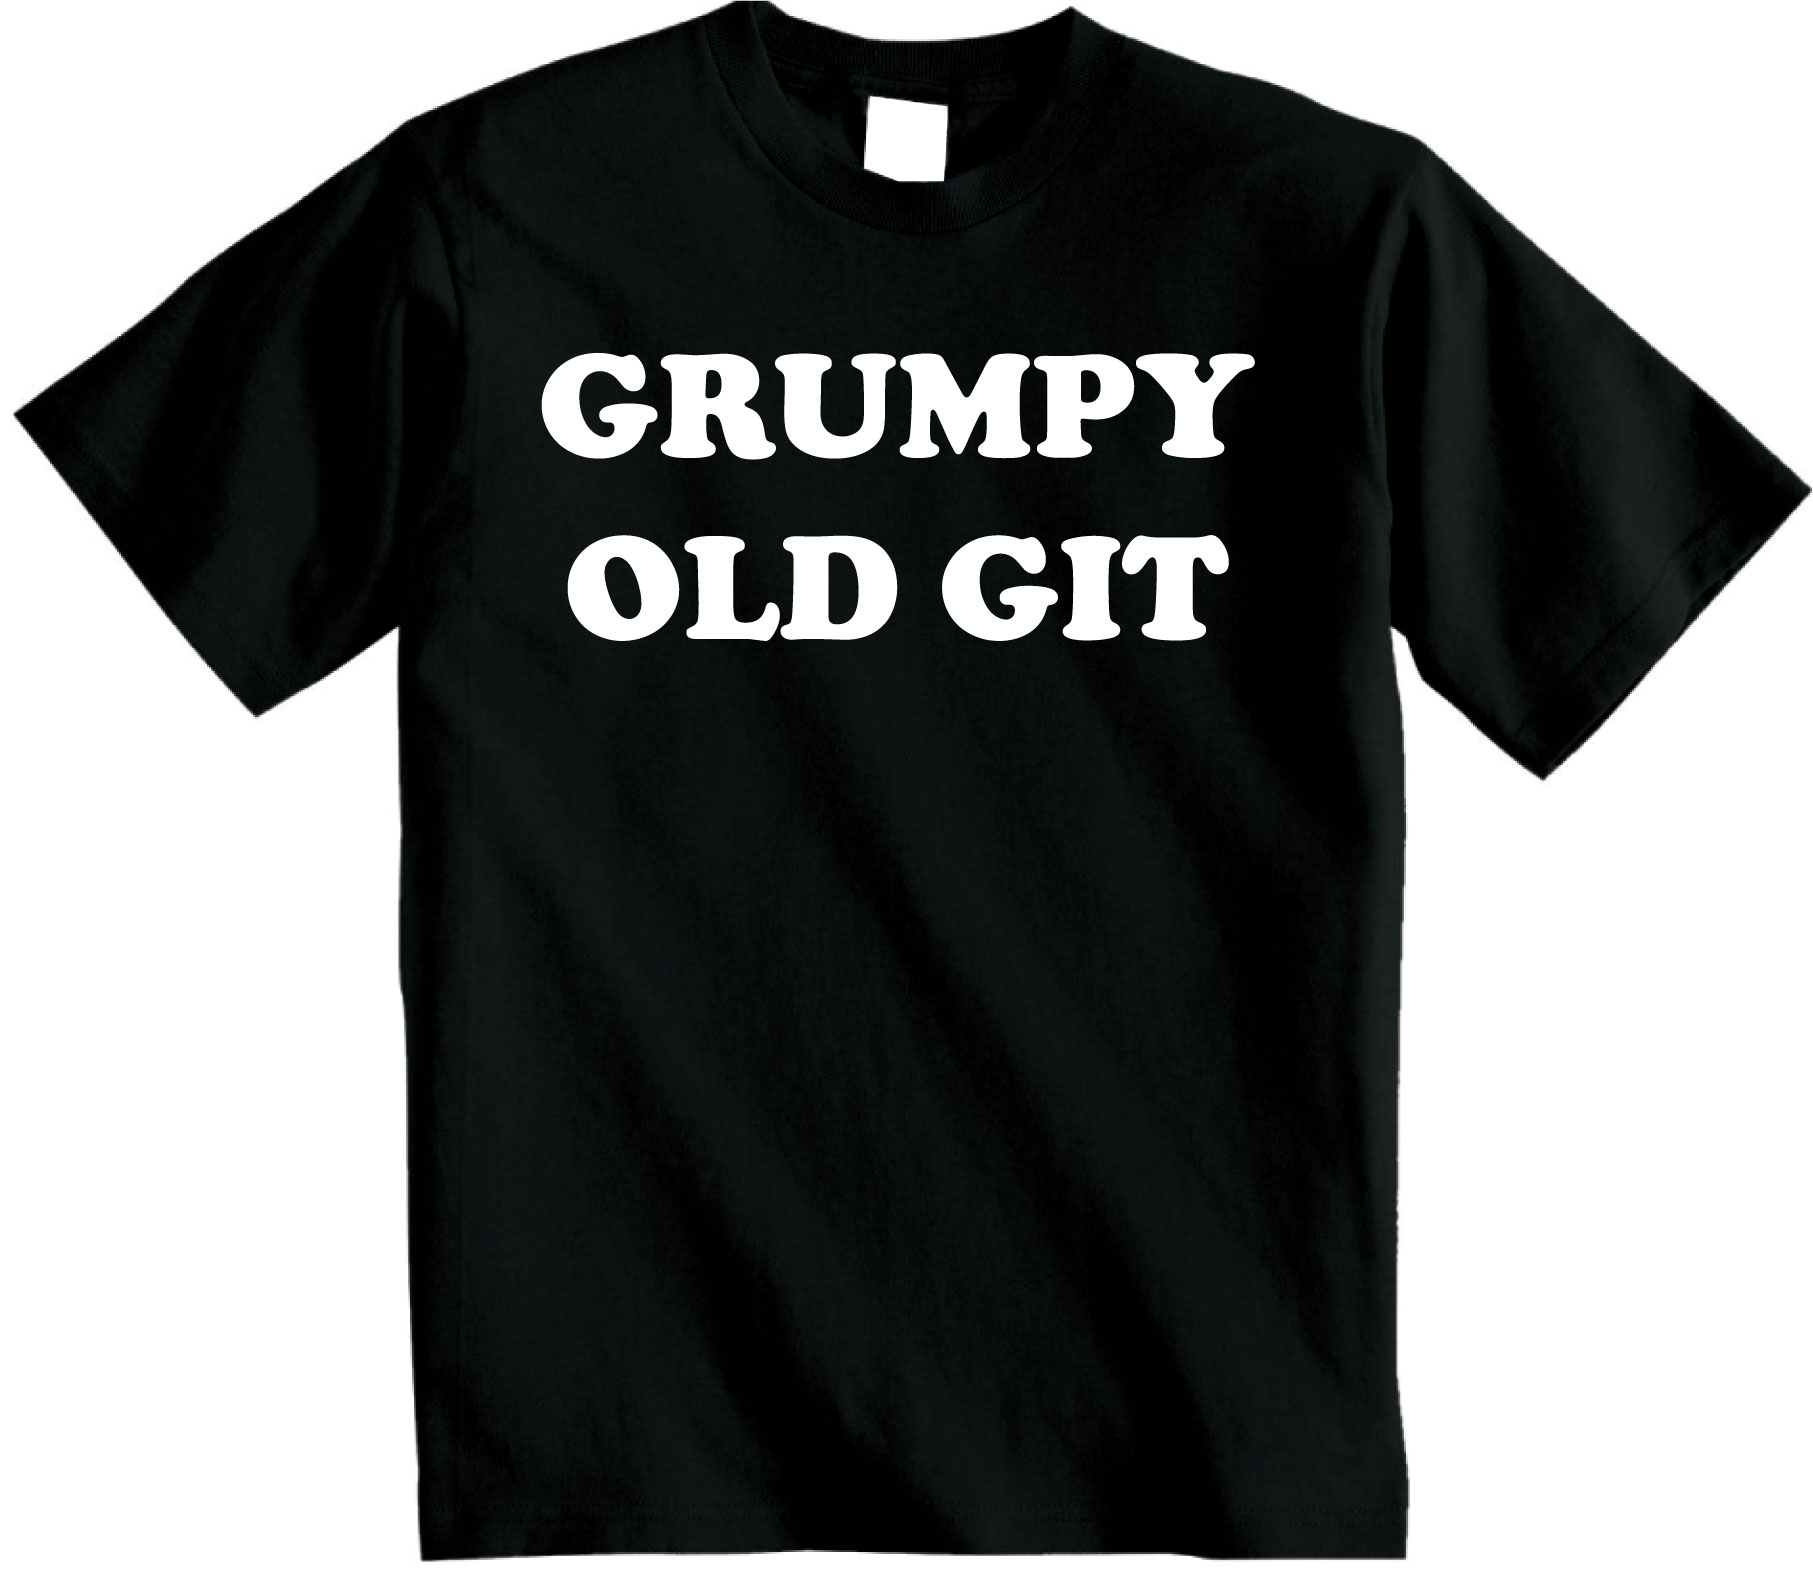 Grumpy old git t-shirt Funny Novelty Unisex Father Dad Tshirt